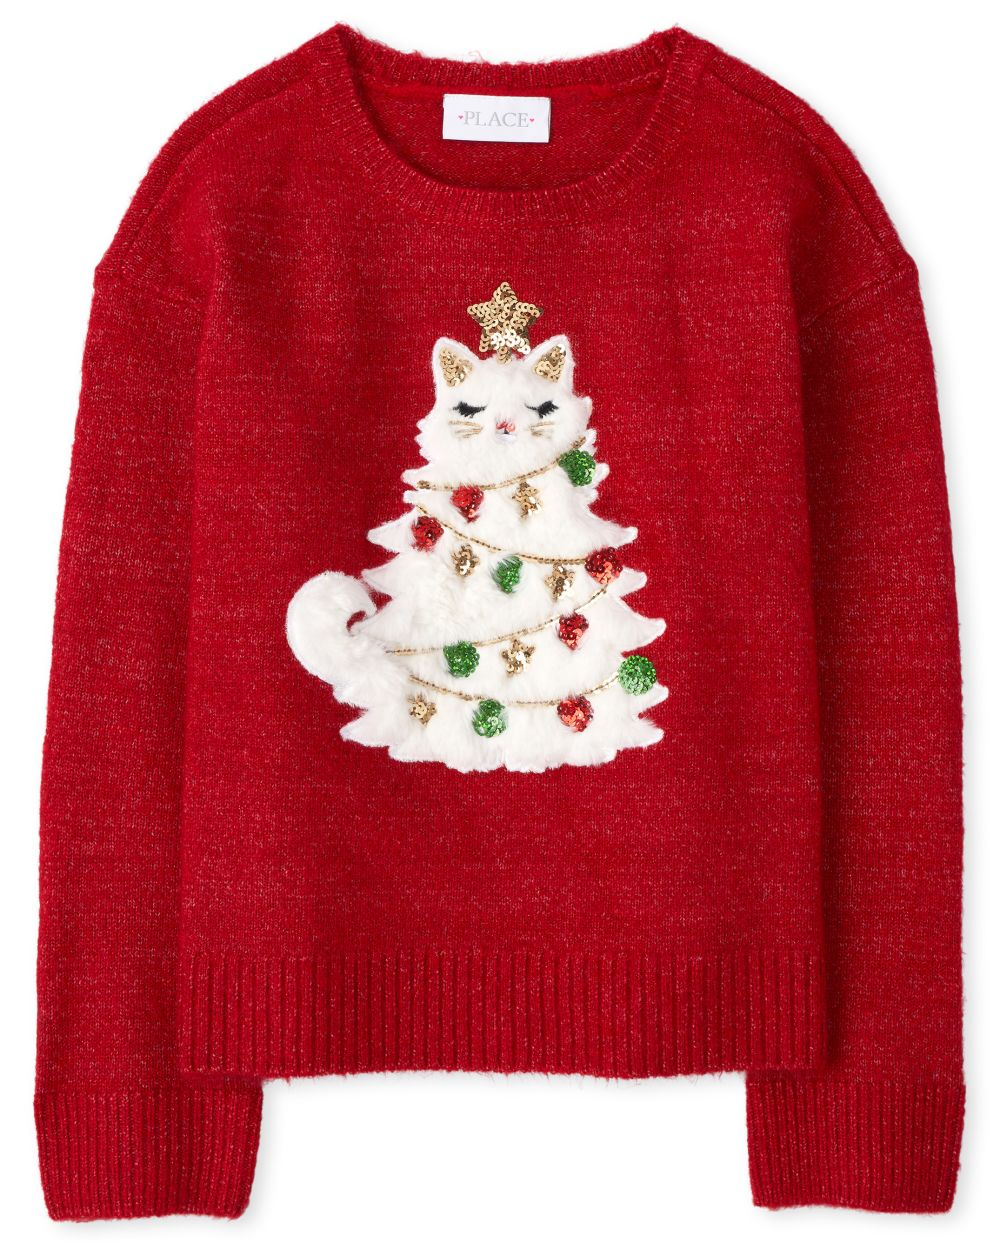 Girls Embellished Christmas Sweater